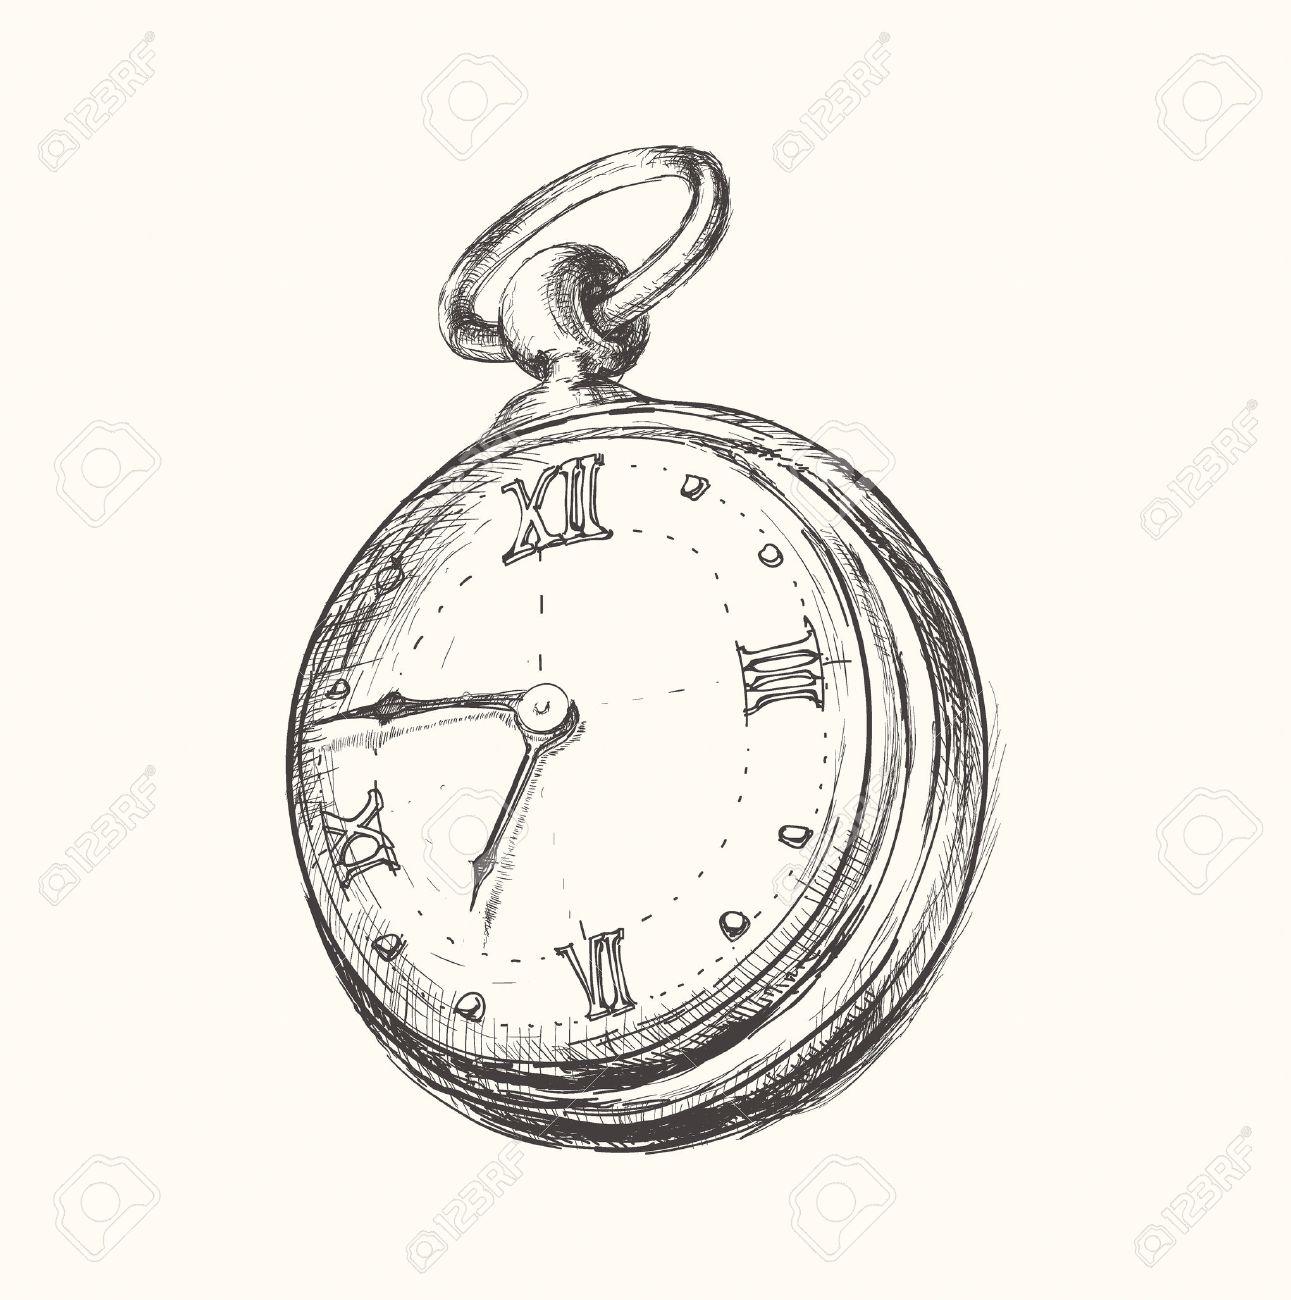 Hand drawn vintage watch clock sketch vector illustration - 47187451